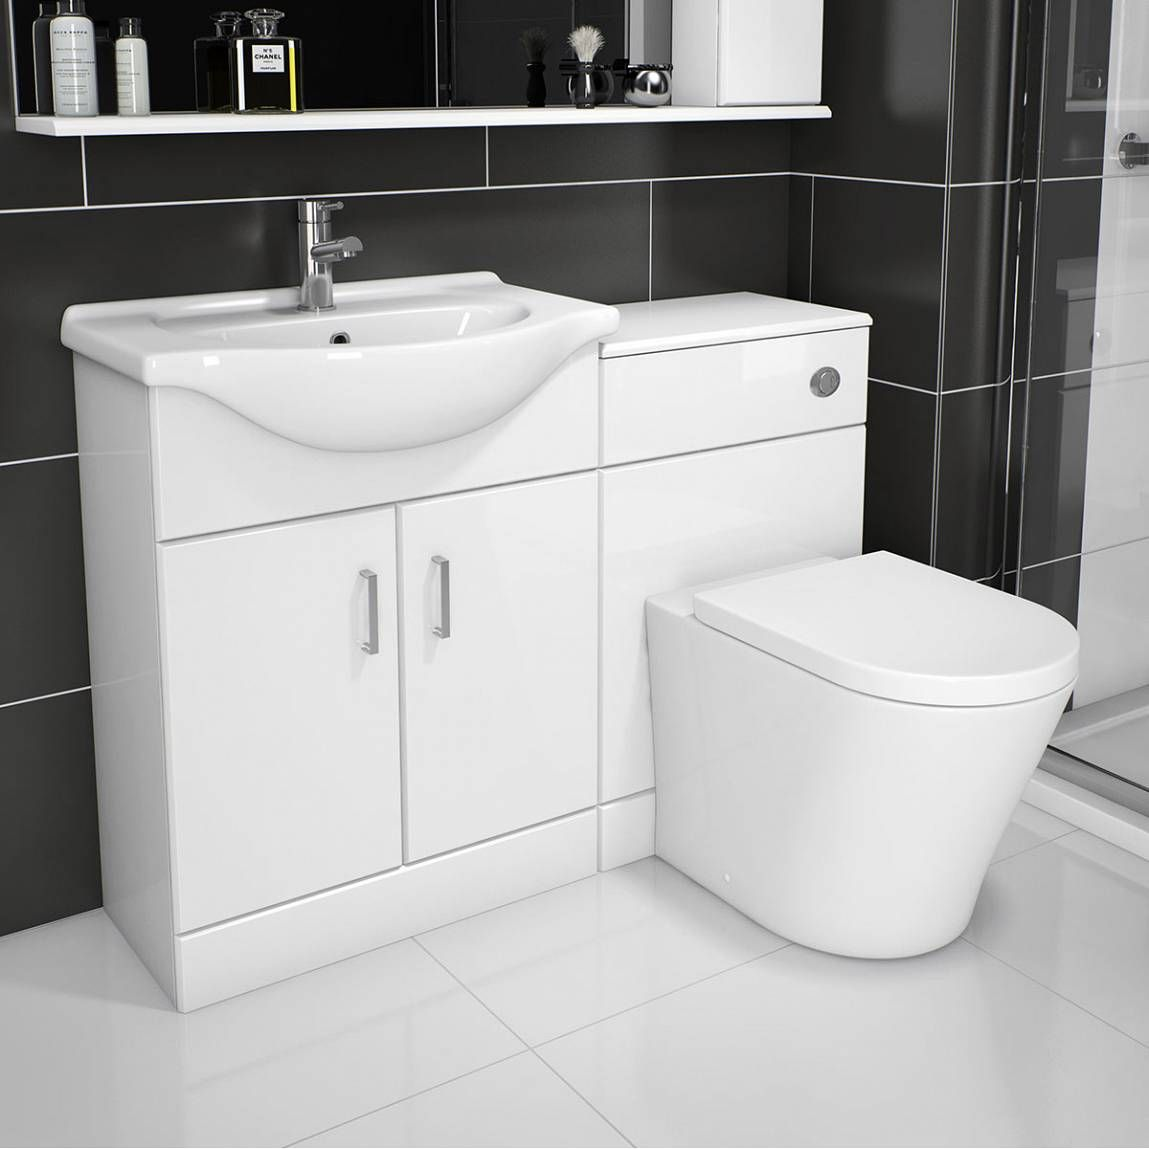 Sienna arc white gloss combination vanity unit small victoria plumb 259 1040mm 450mm